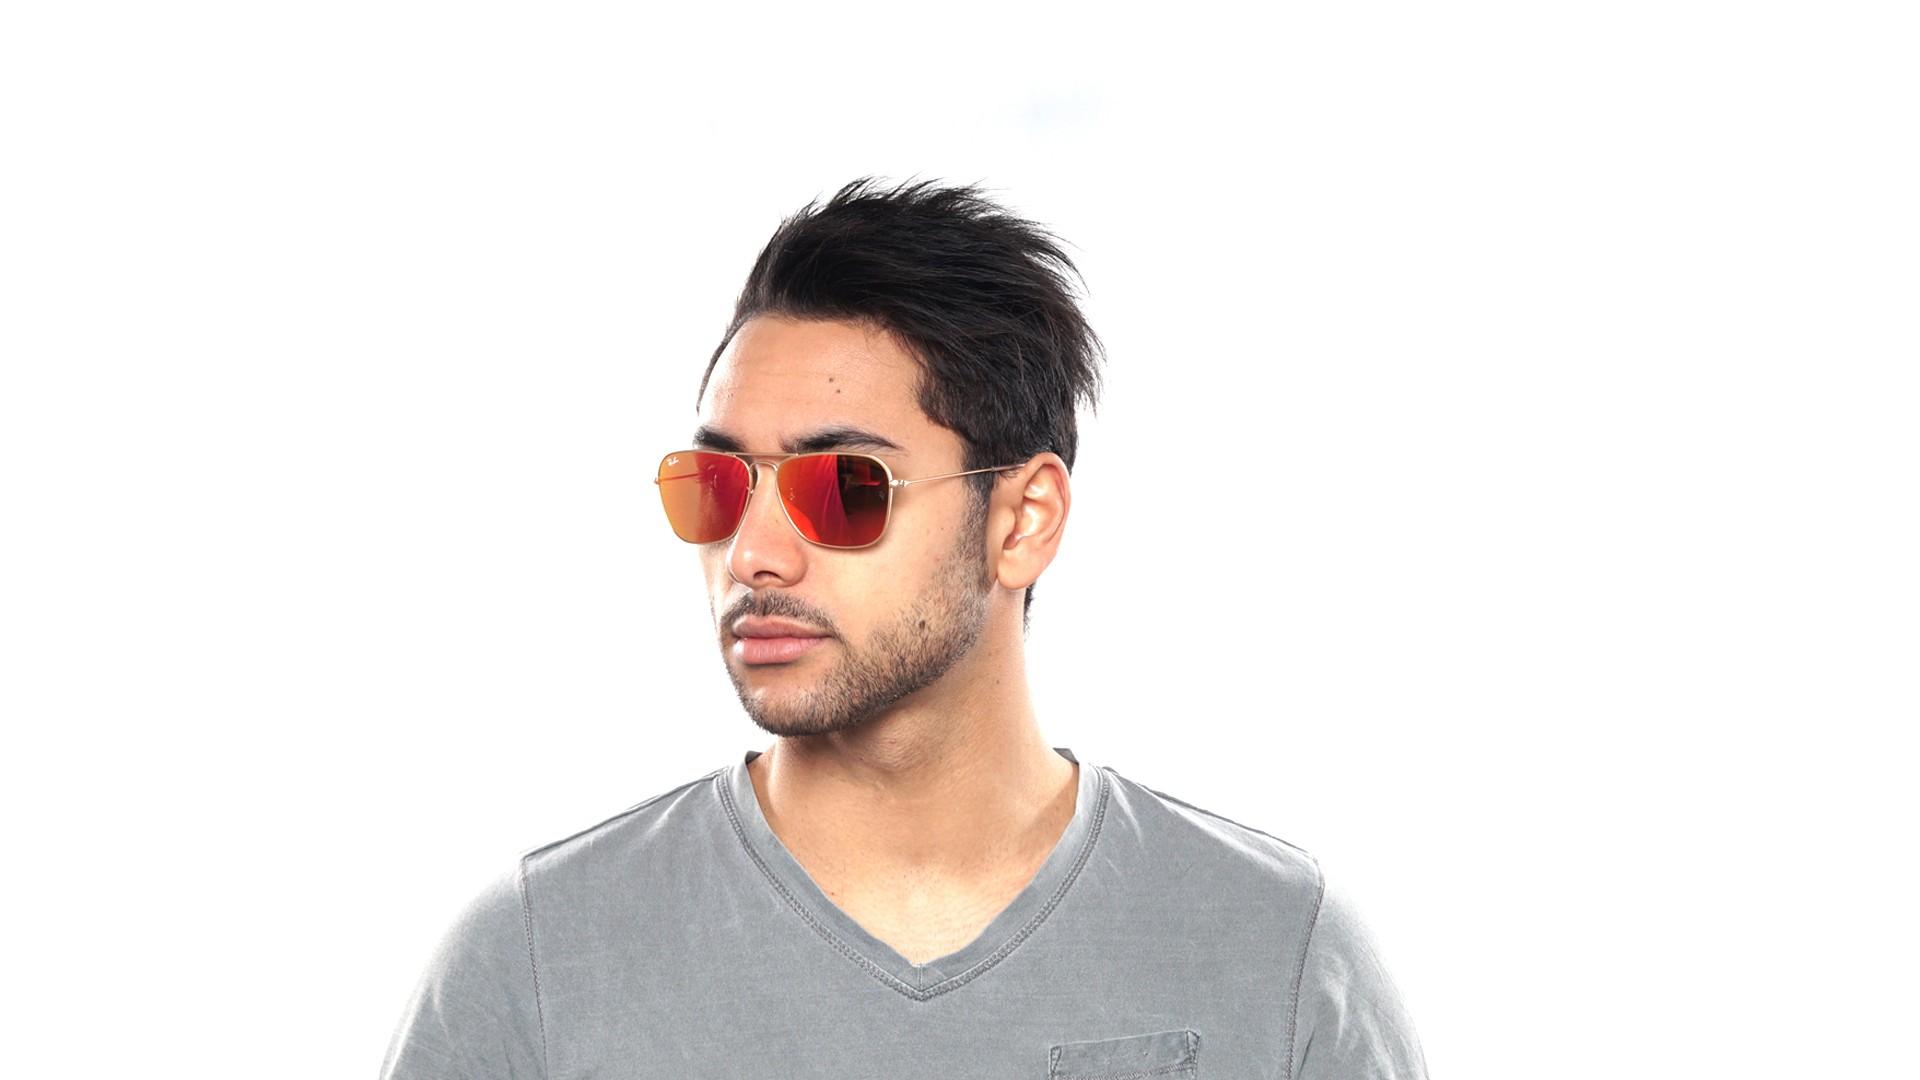 c951362361 Sunglasses Ray-Ban Caravan Gold Flash Lenses RB3136 112 69 58-15 Large  Mirror